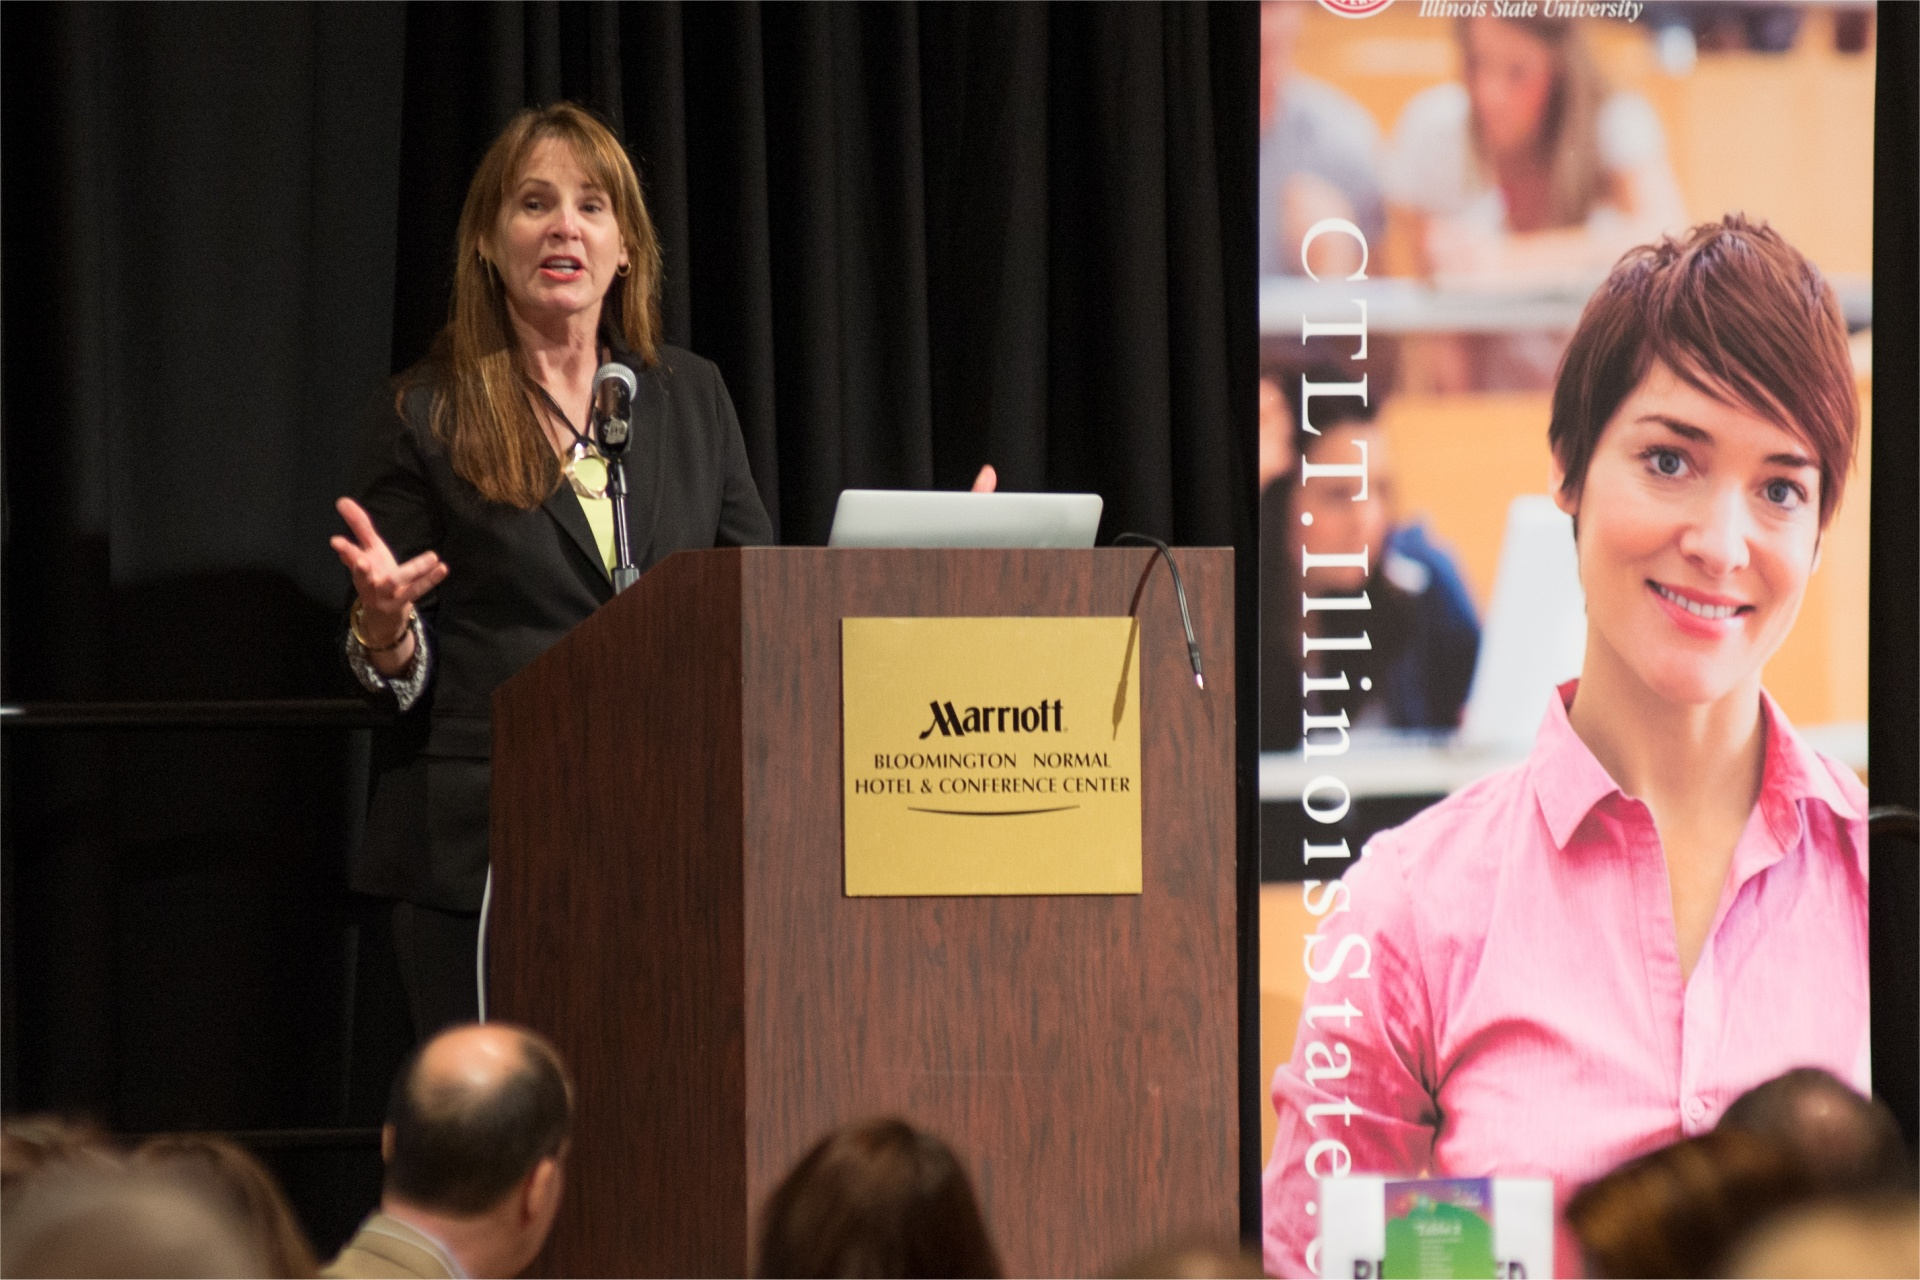 A past Symposium keynote speaker